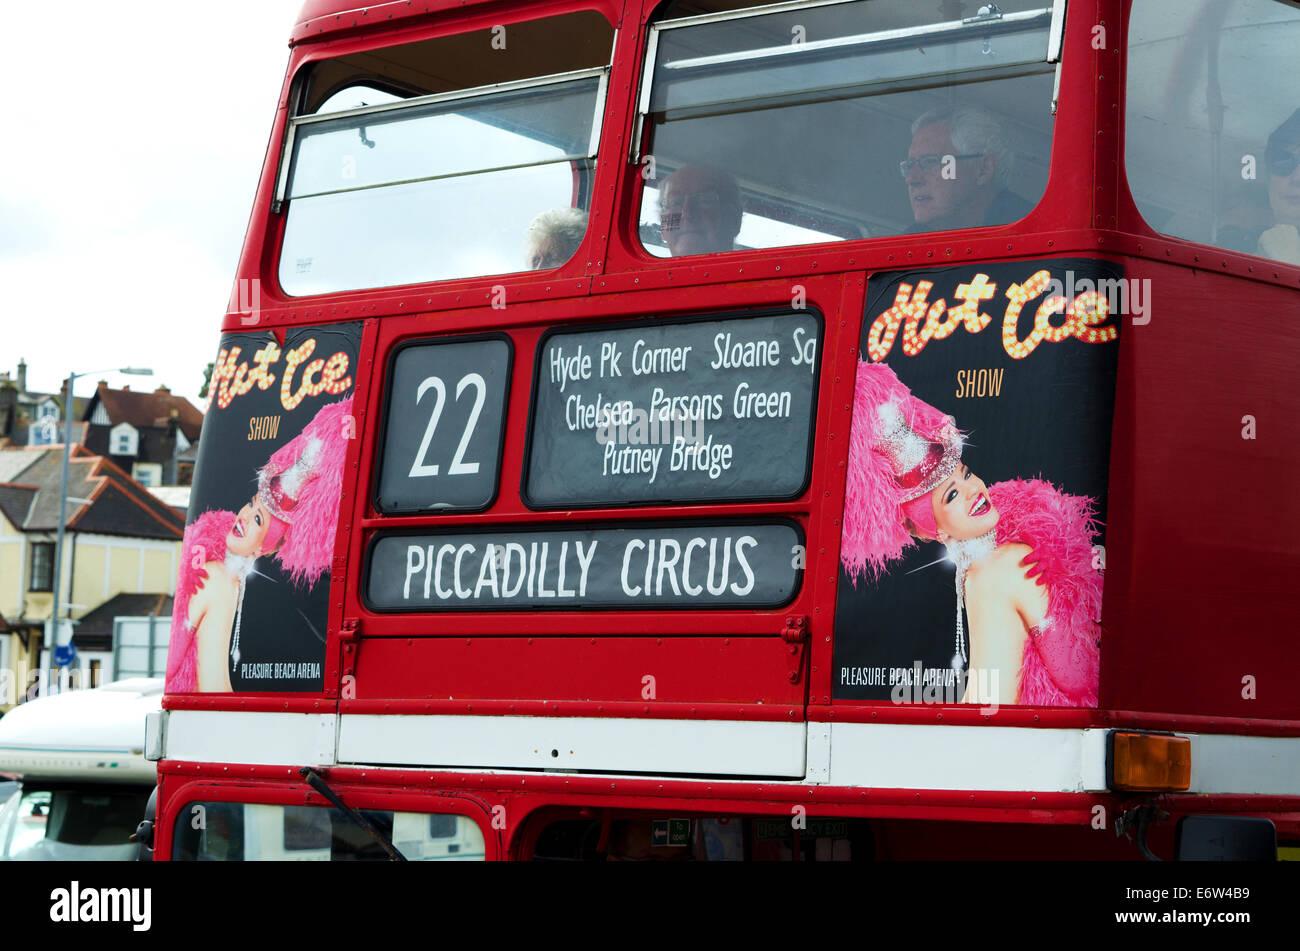 A London Tour Bus - Stock Image